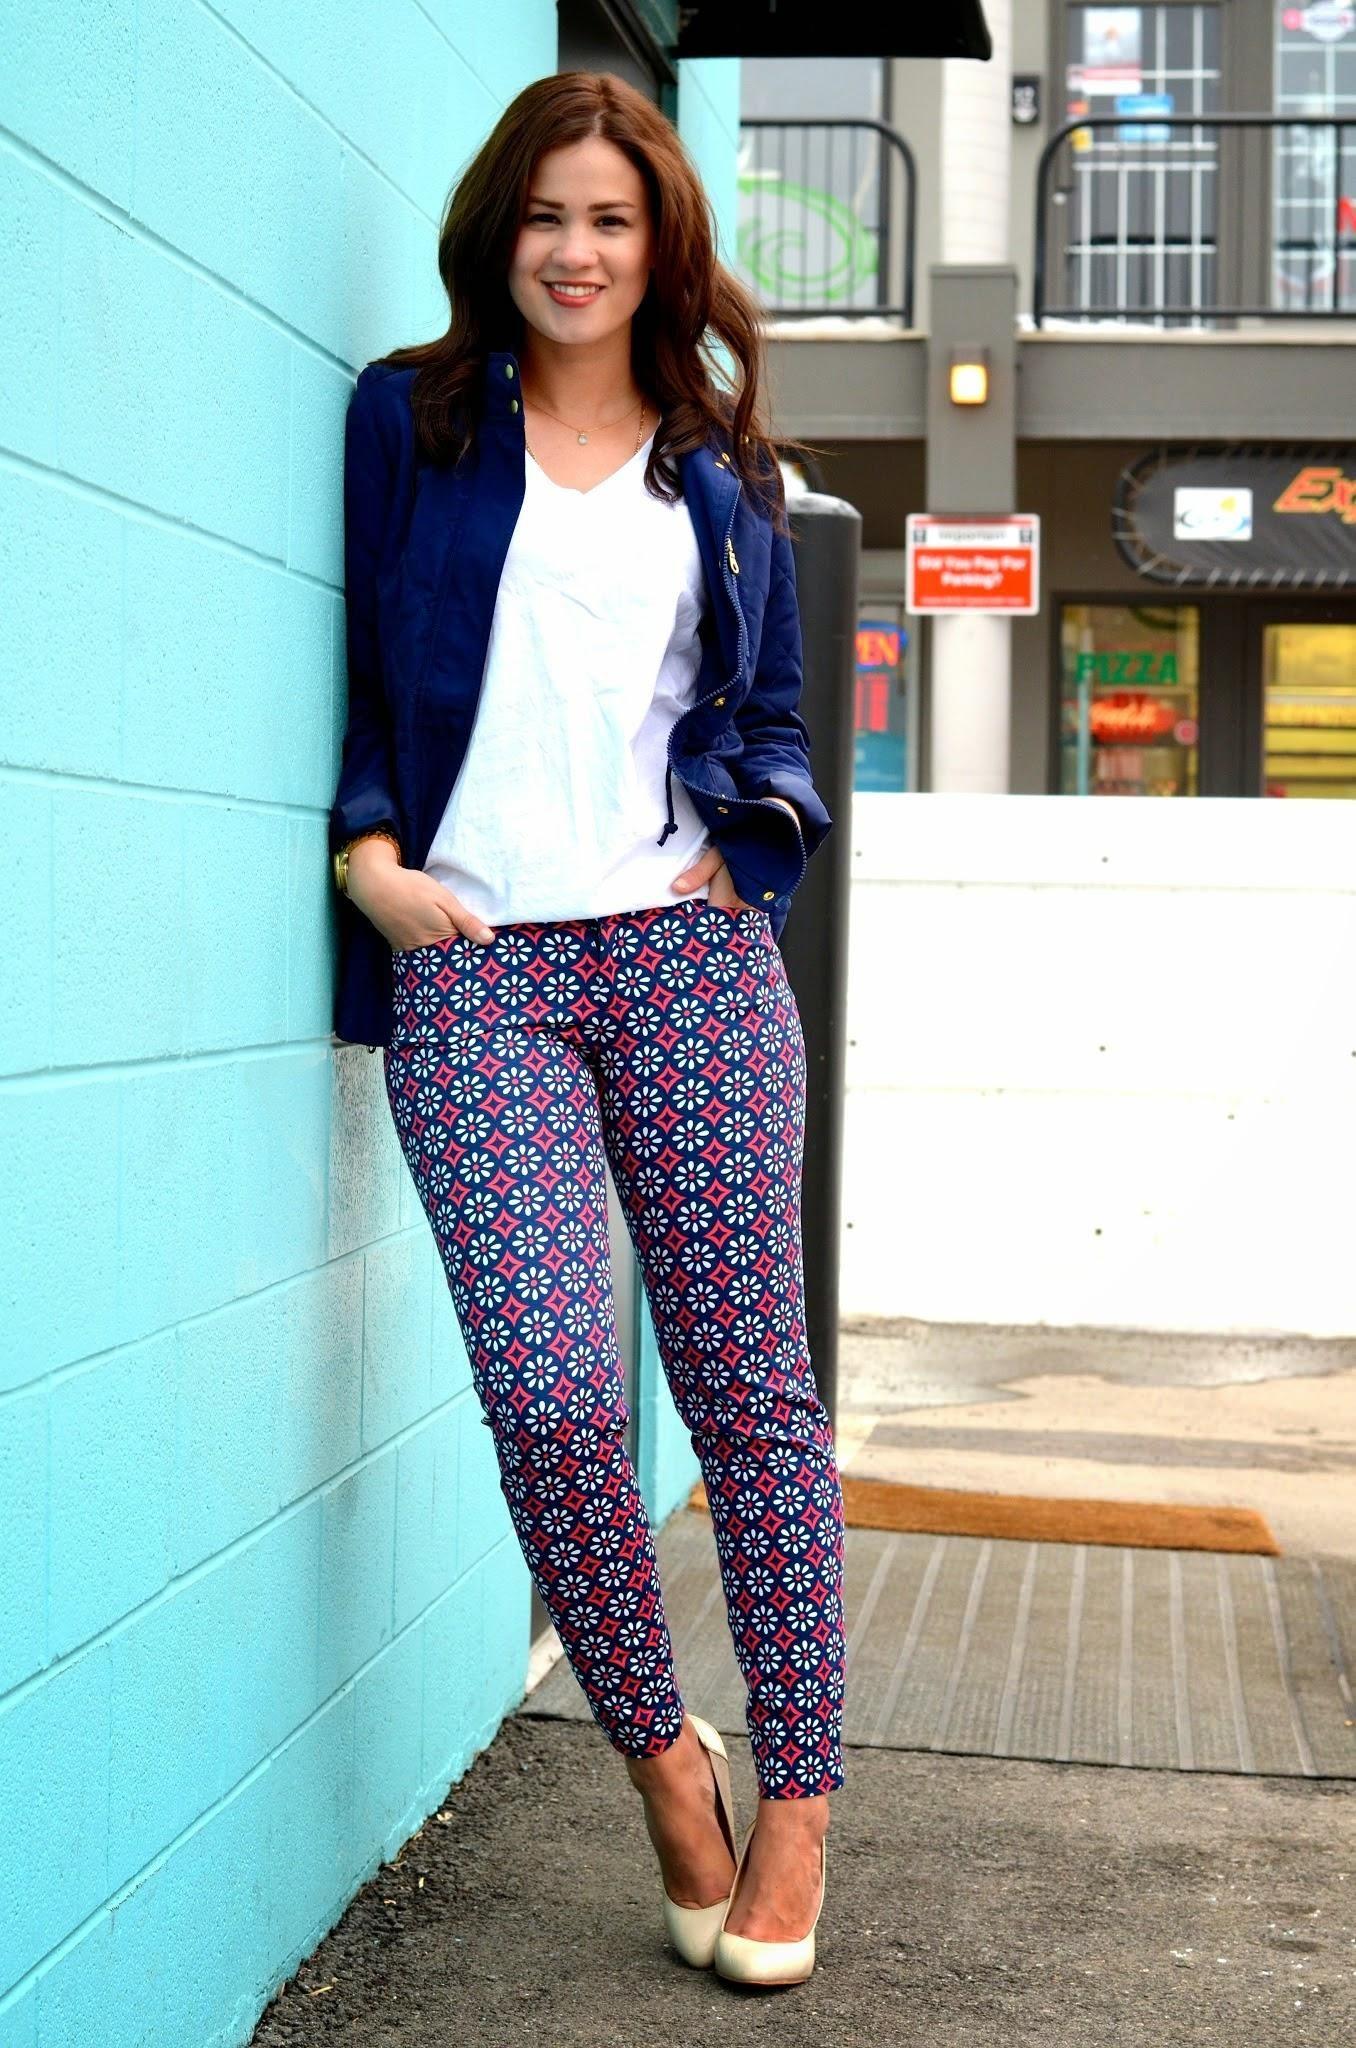 Women's Patterned pant